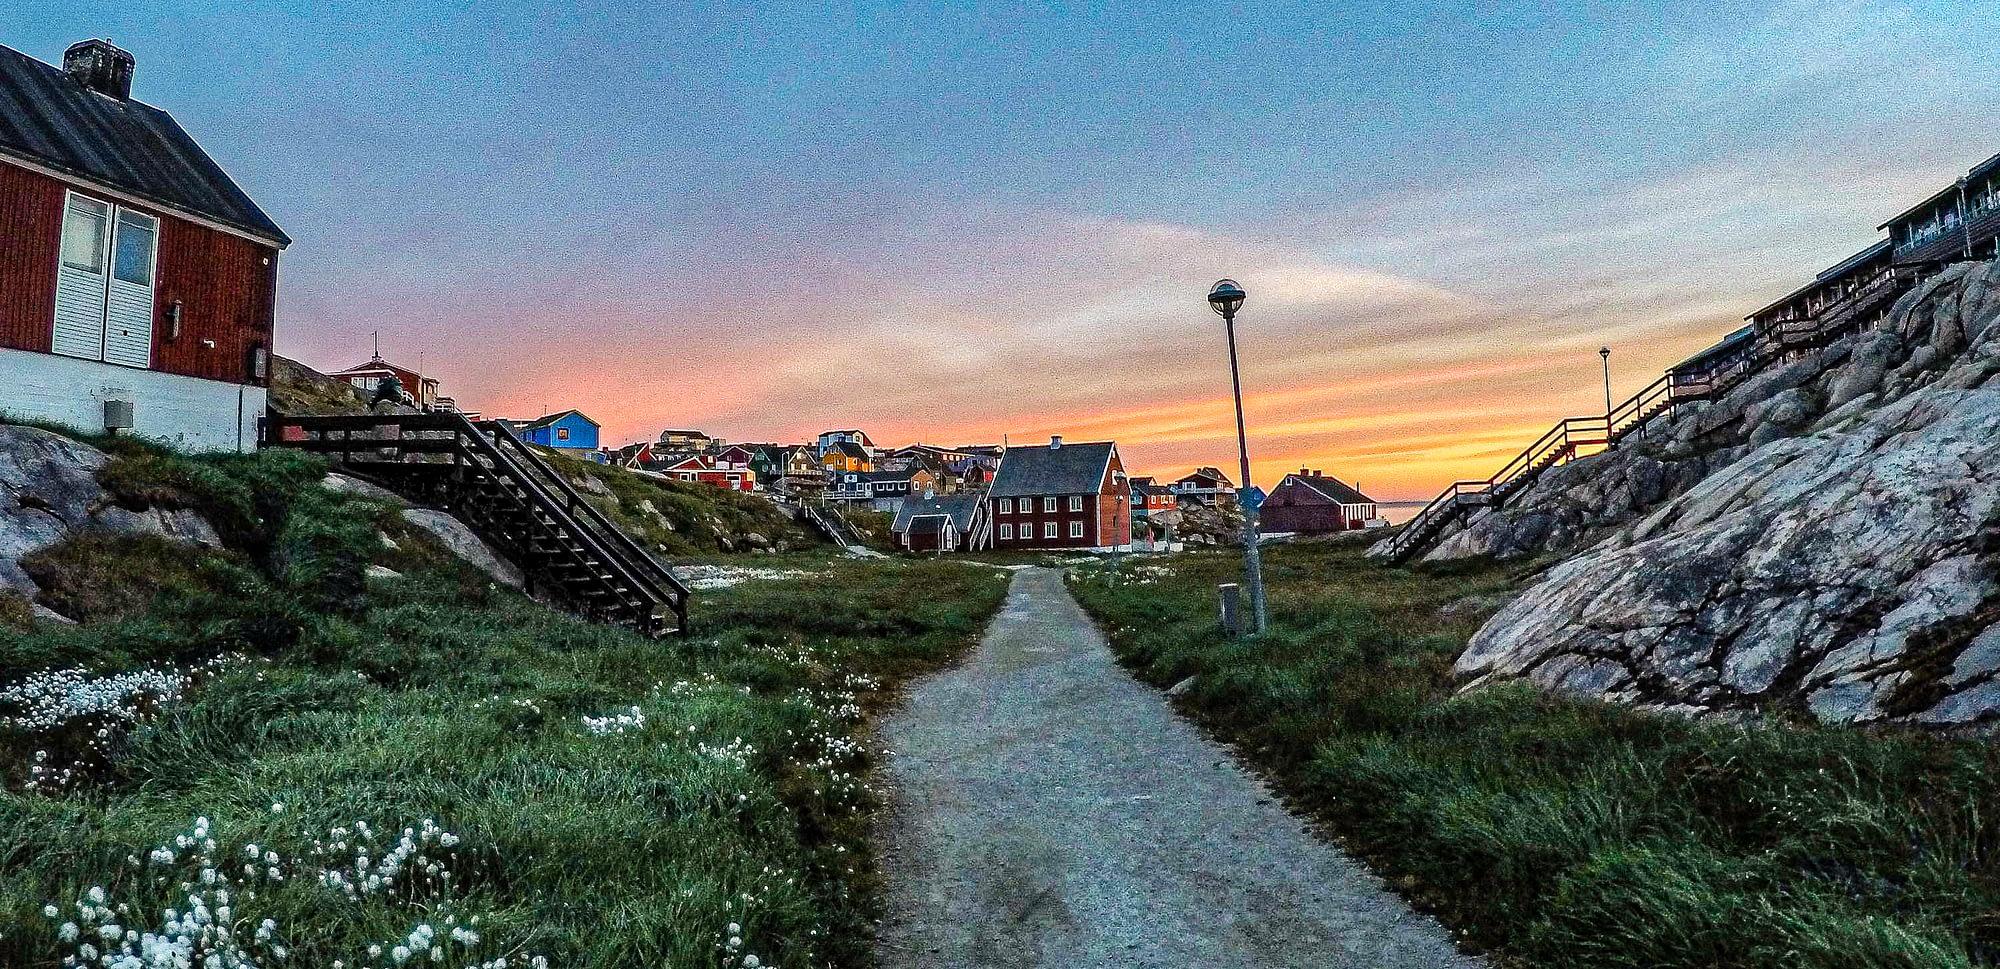 Ilulisat, Greenland